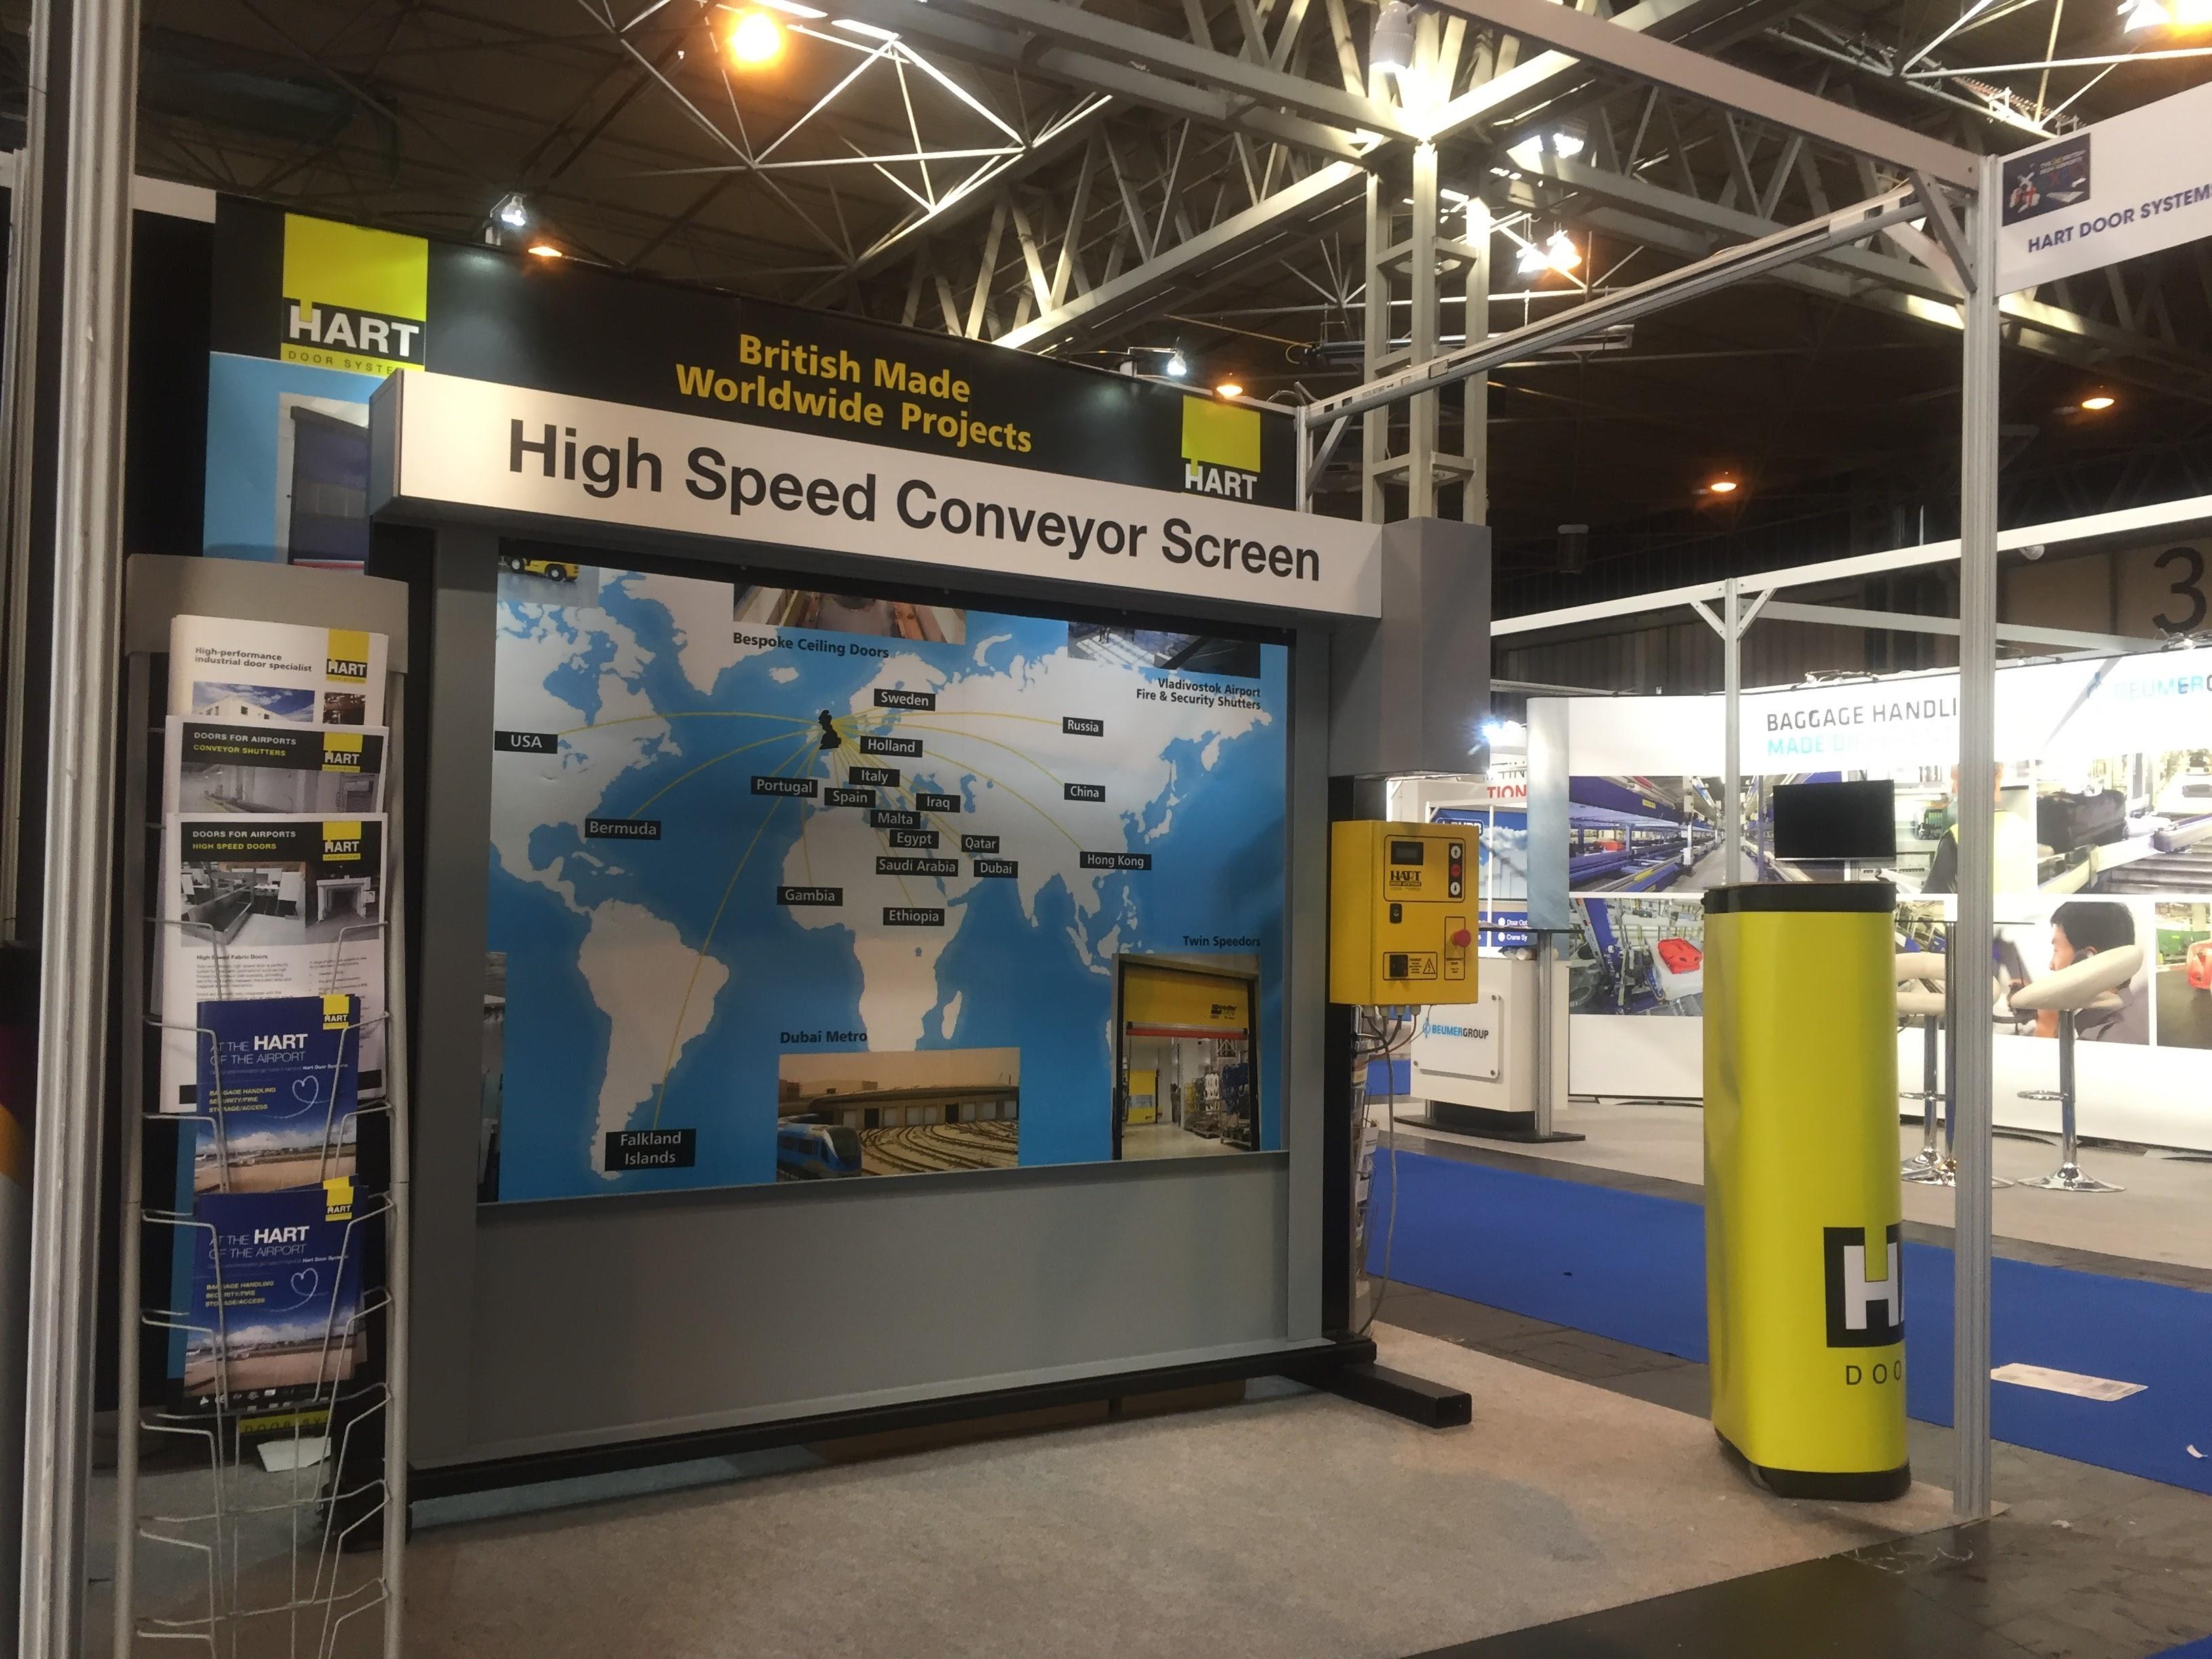 Hart Door Systems - Airport Door Systems for Baggage